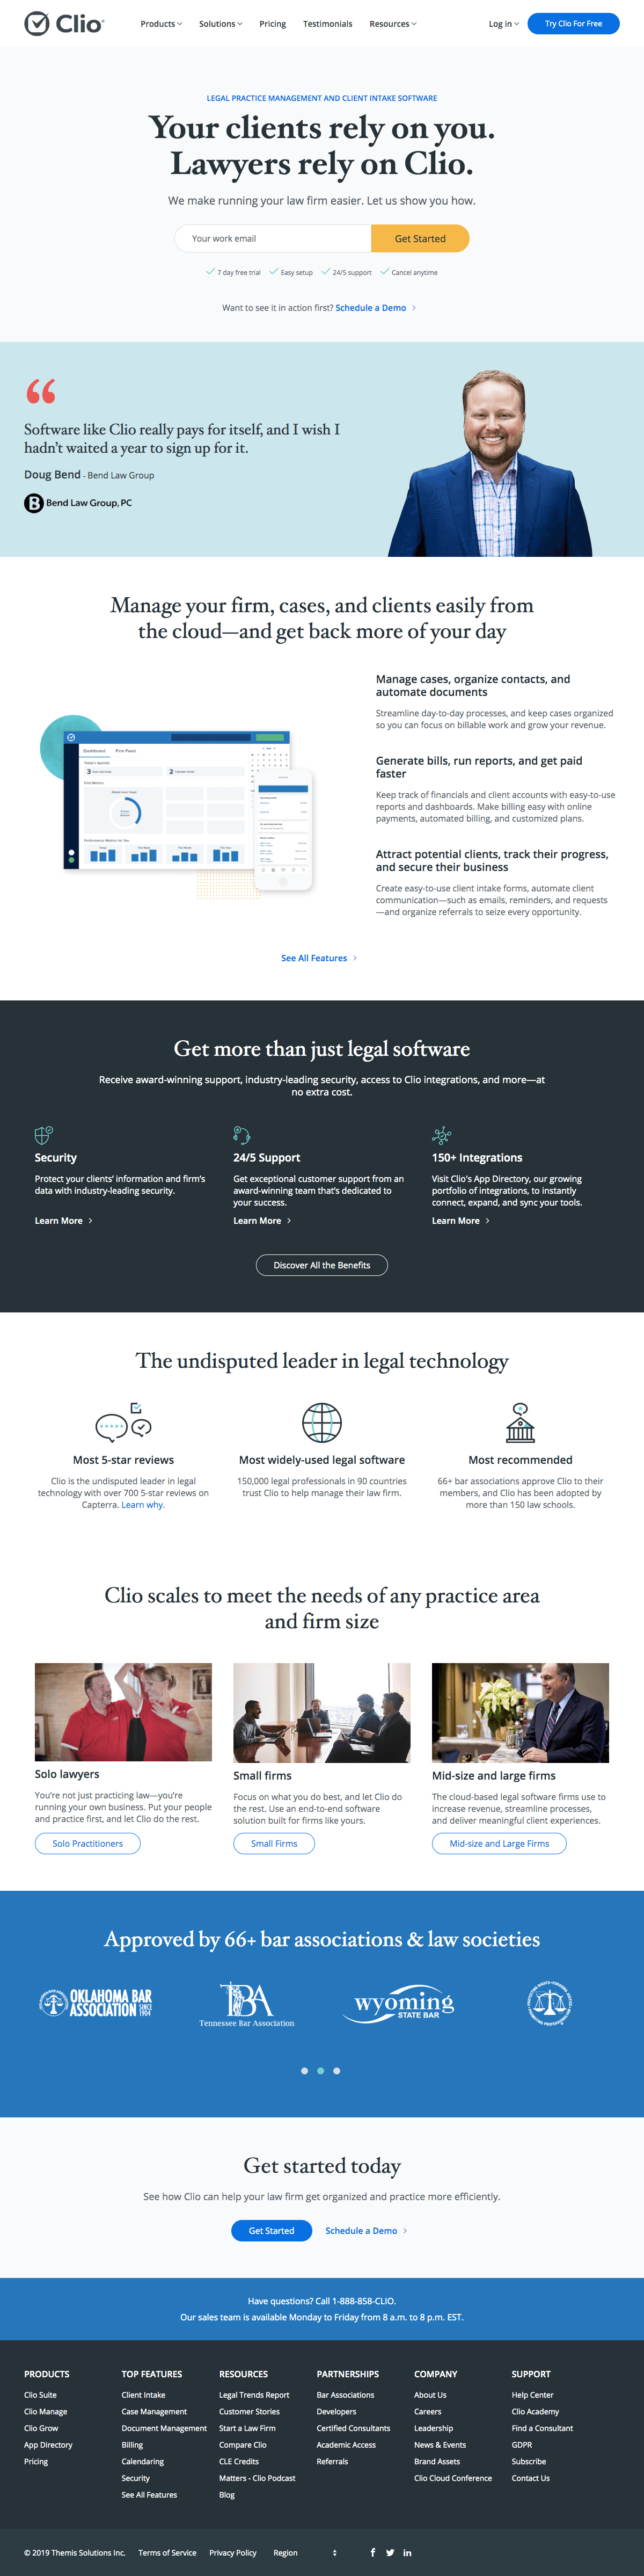 Clio - Homepage